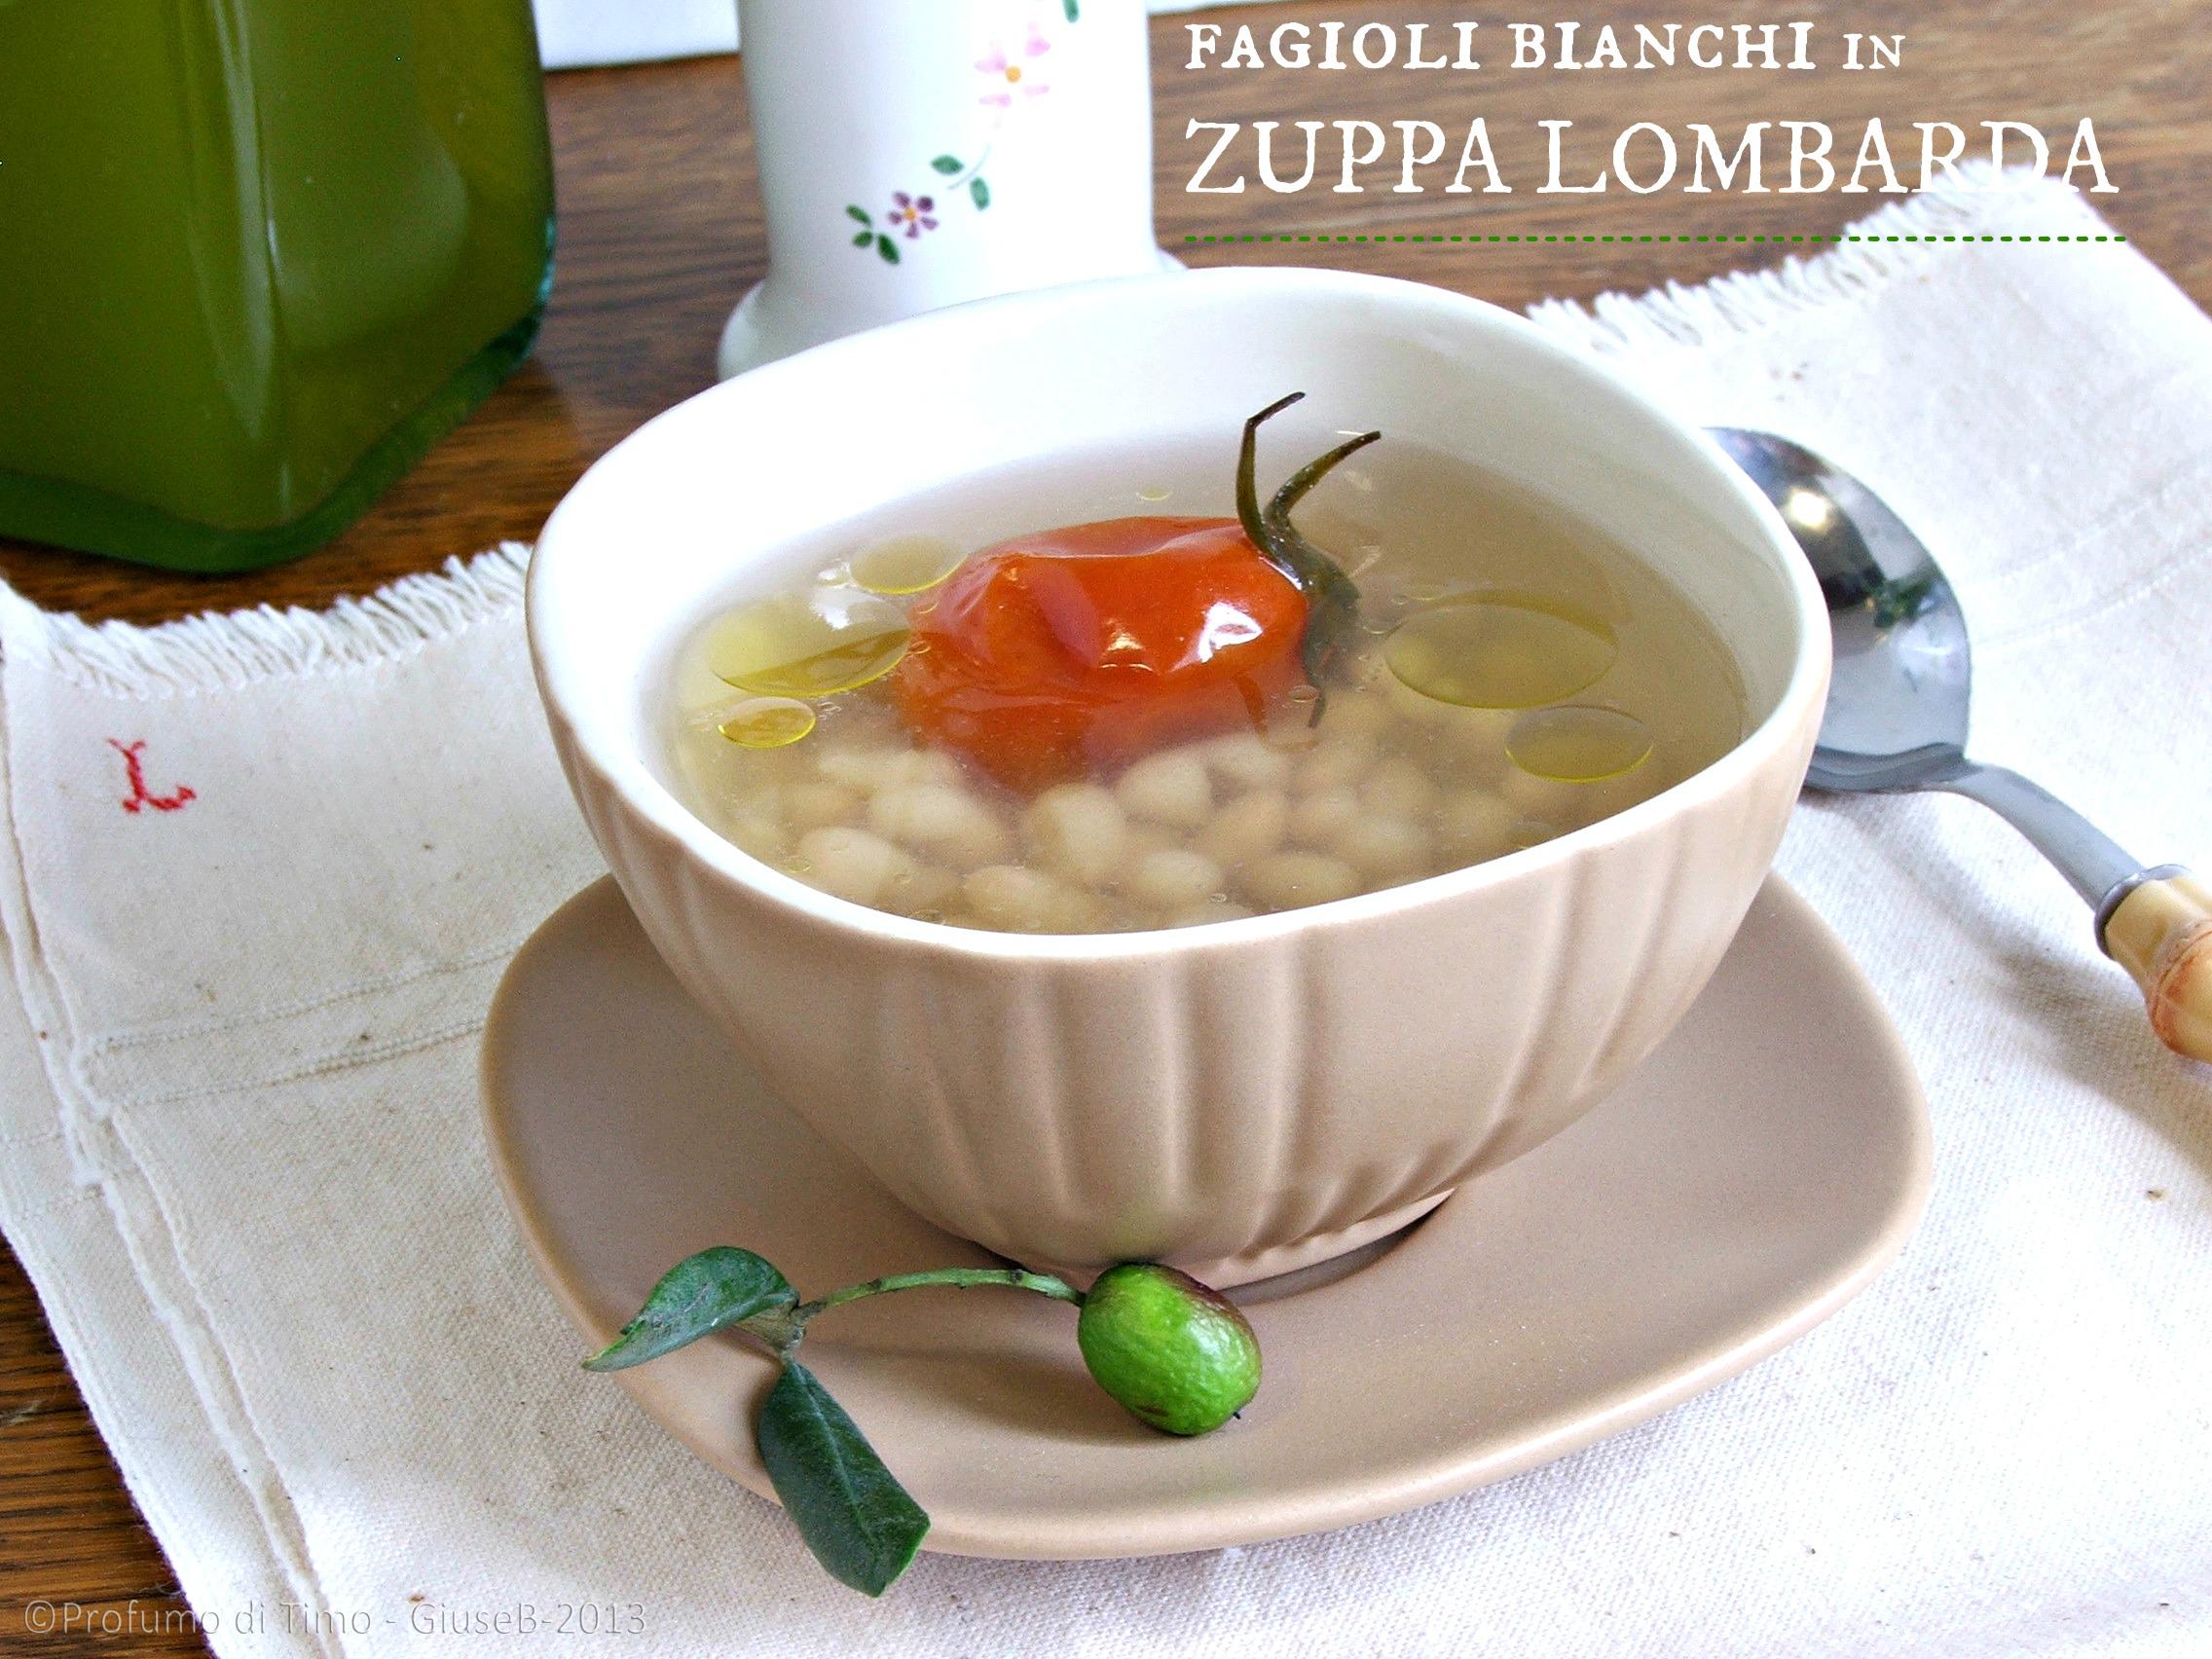 Fagioli bianchi in Zuppa lombarda